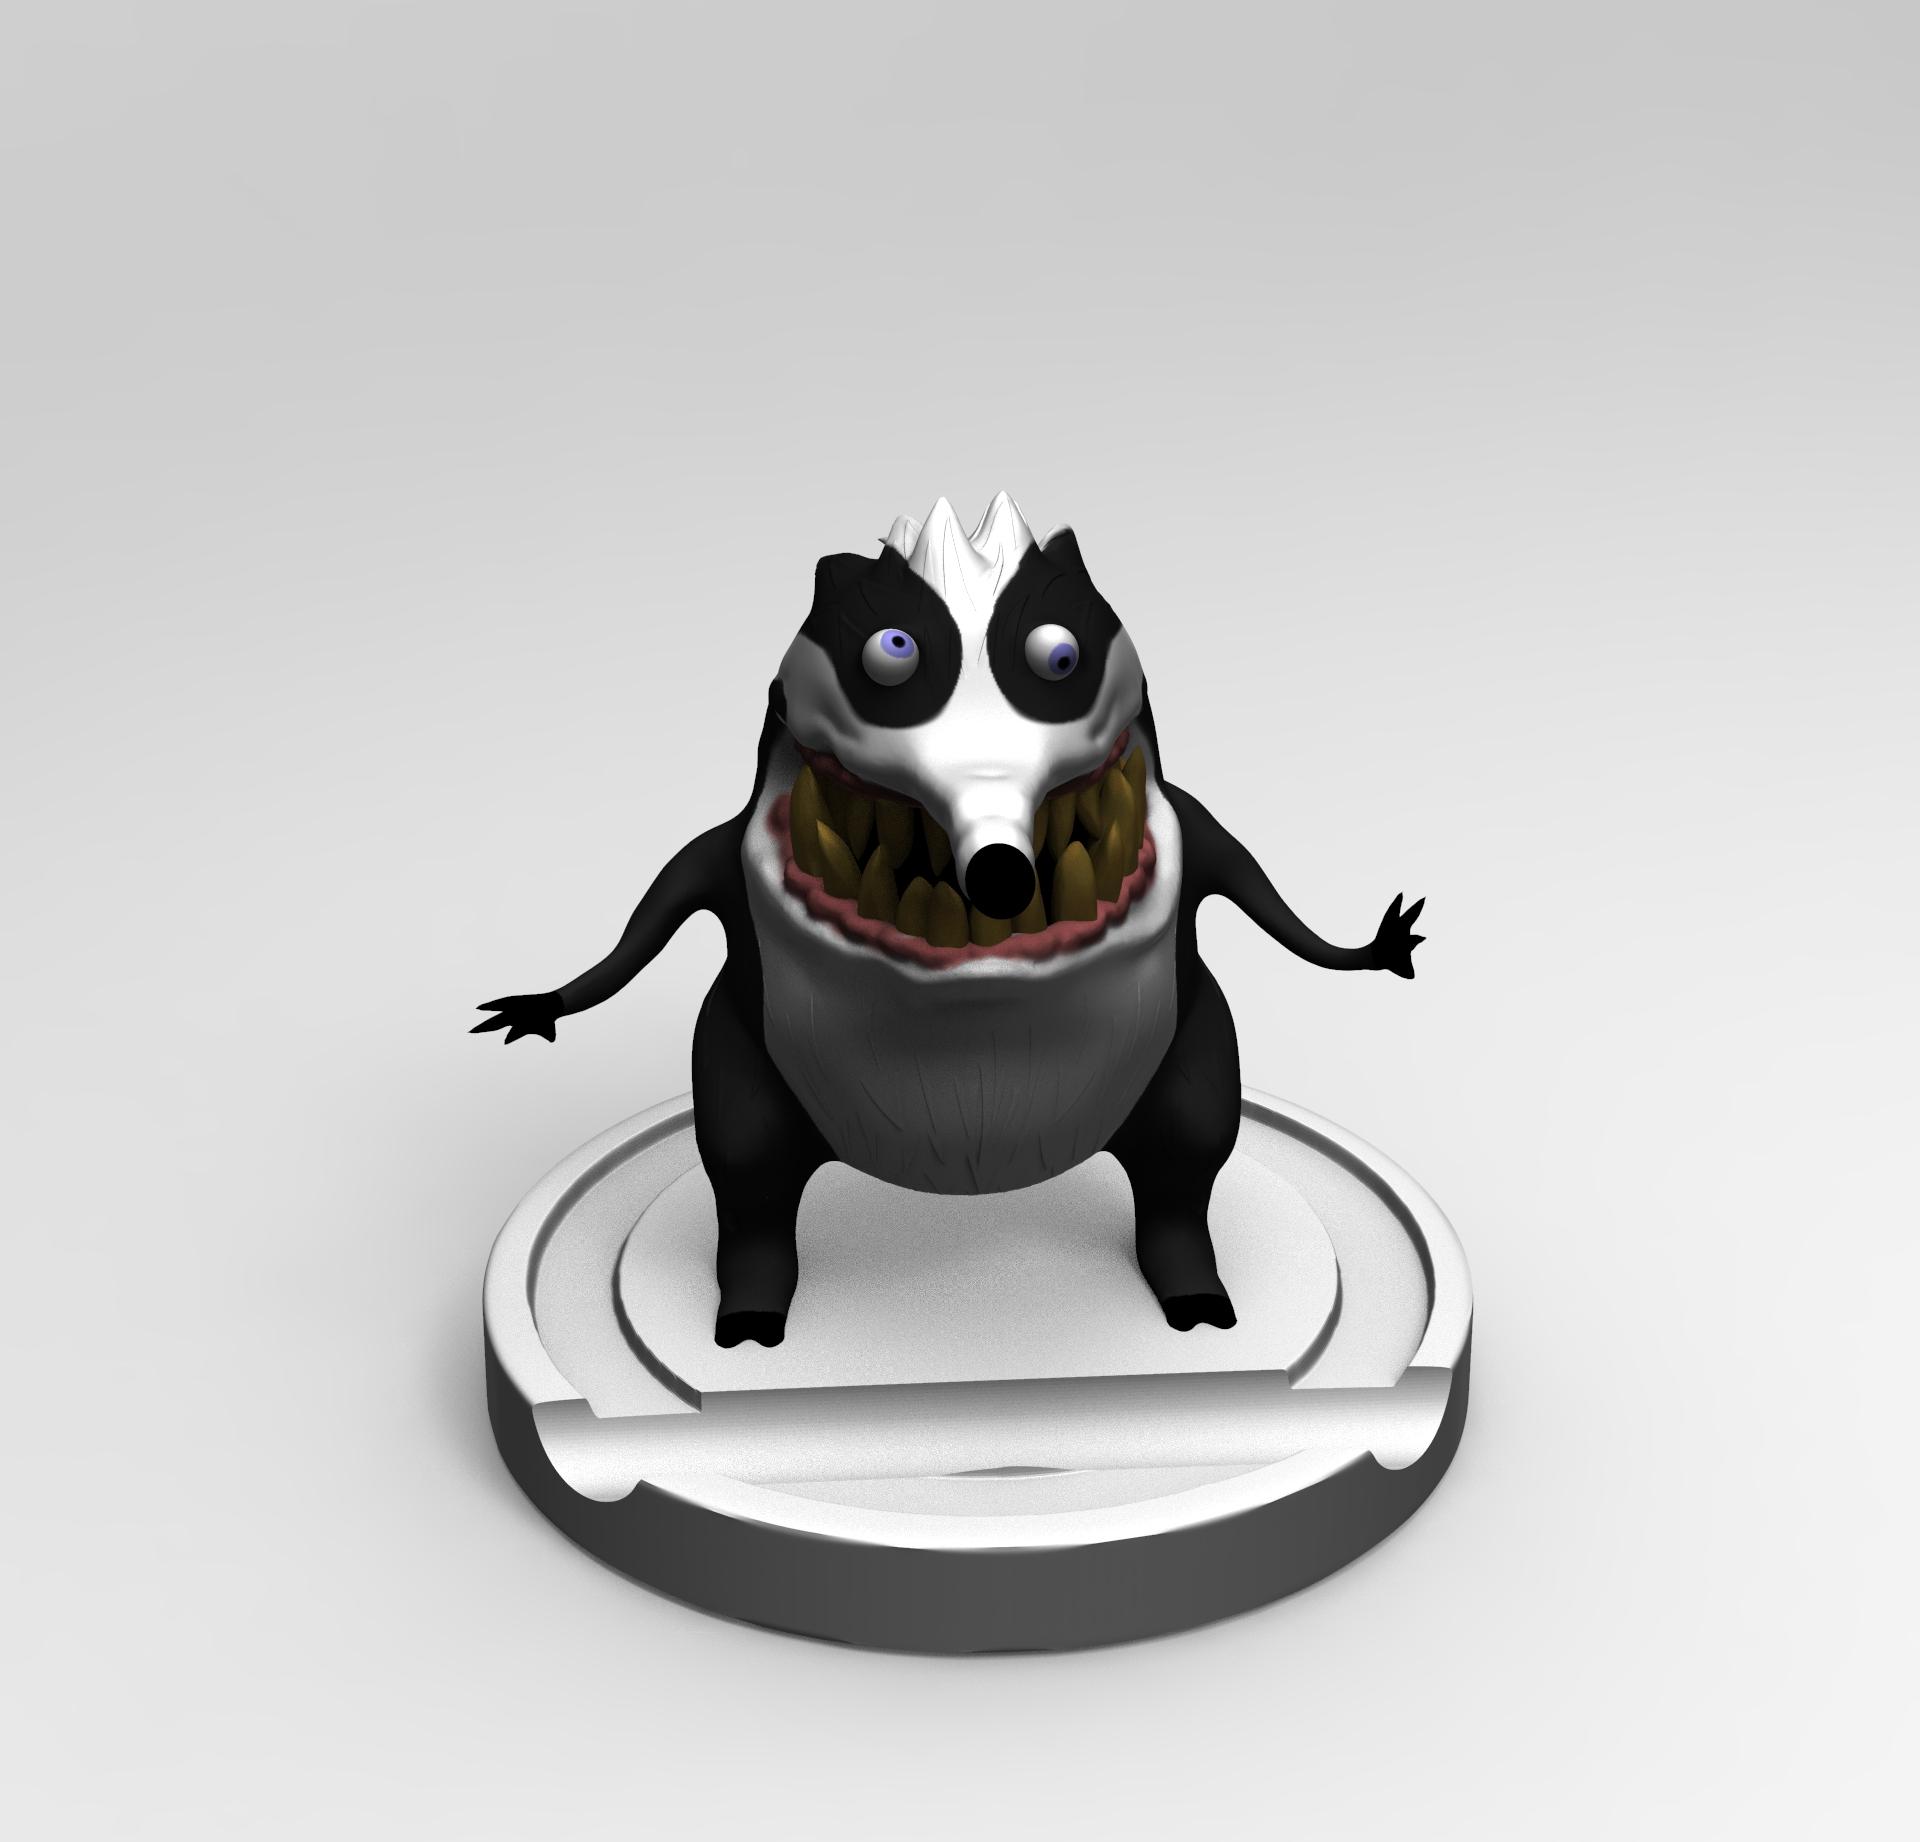 untitled.50.jpg Download free STL file Badger Woodpeaker • Template to 3D print, mefedef